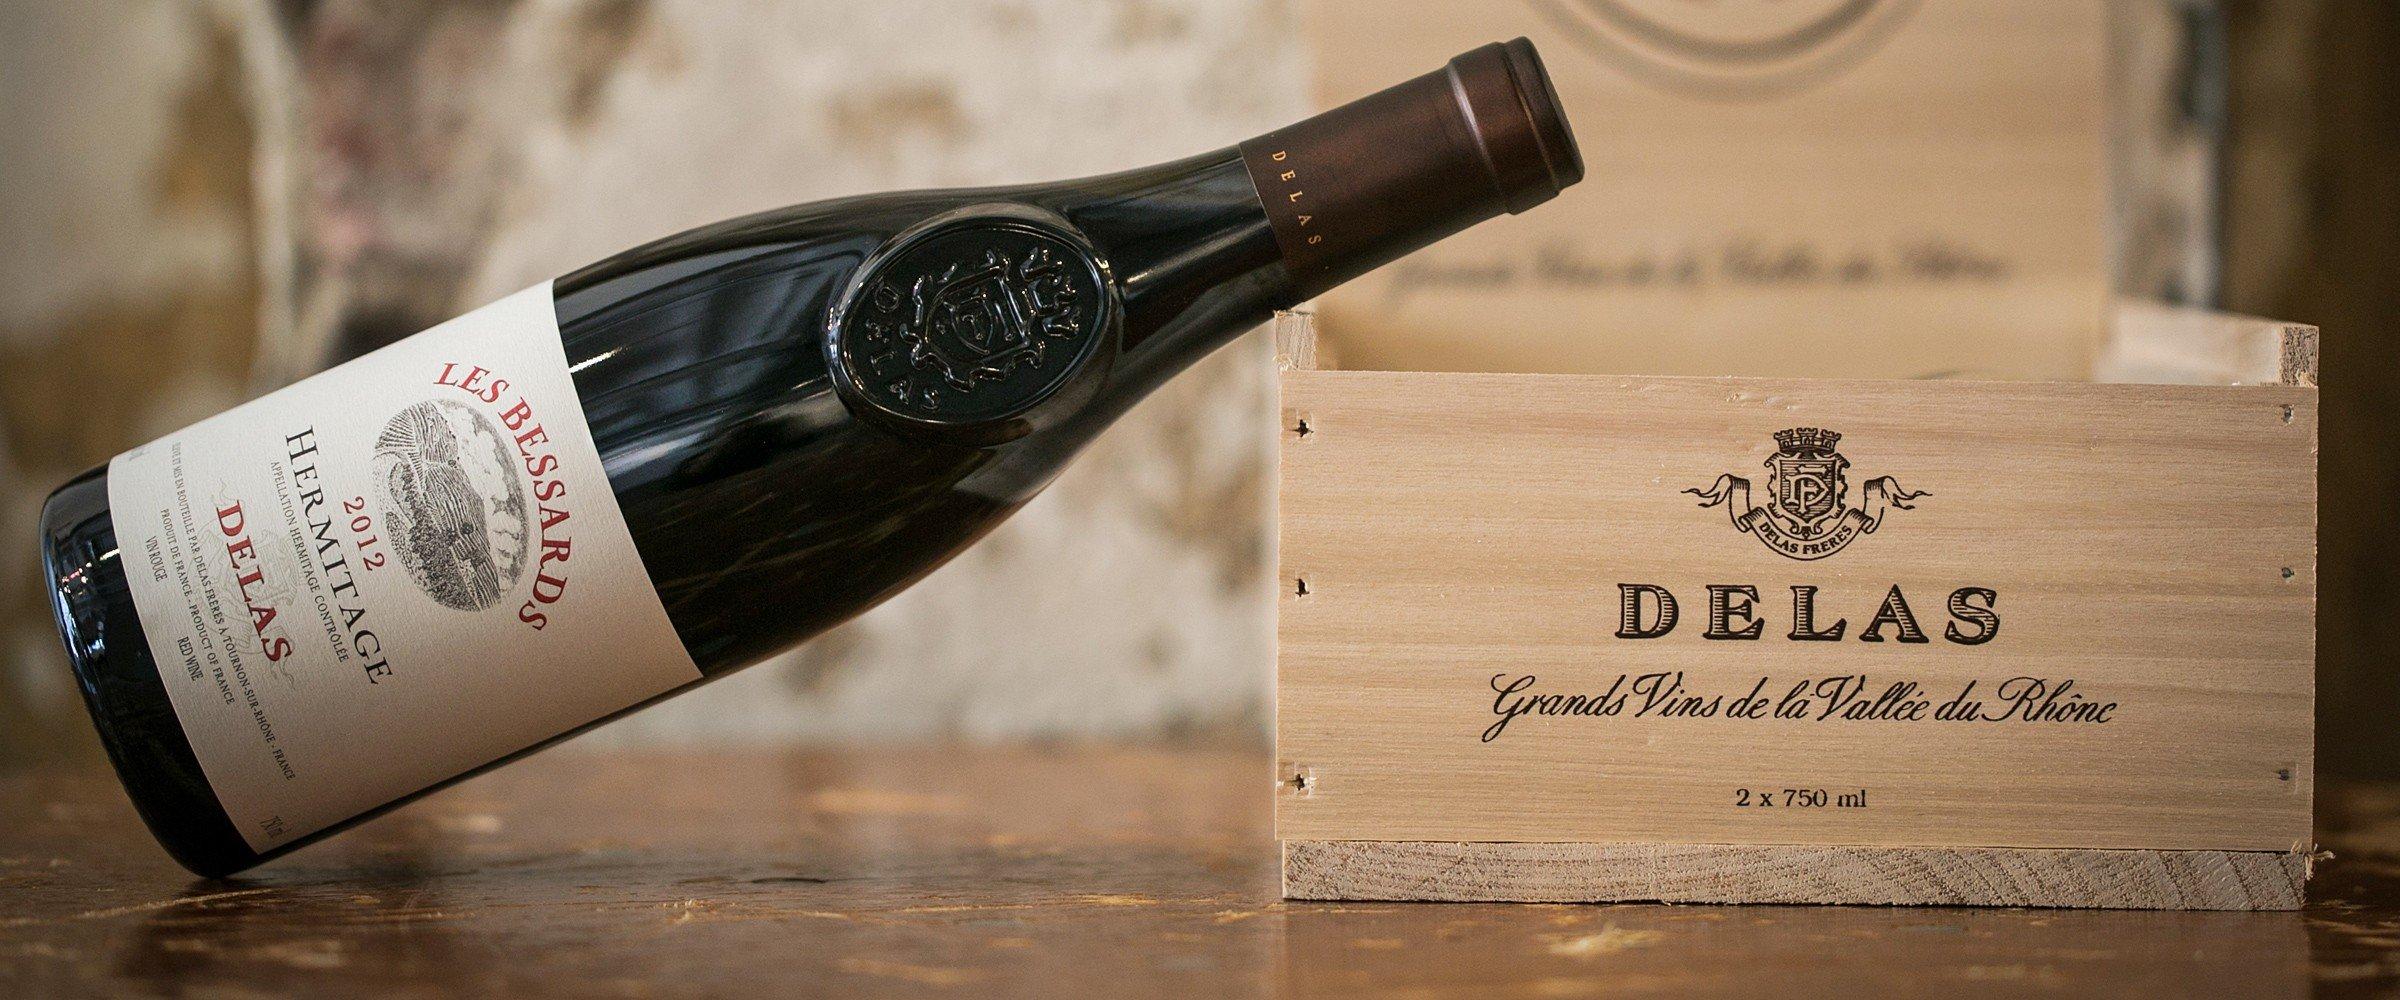 delas-freres-les-bessards-with-wooden-case-for-splash-263-1496961770.jpg